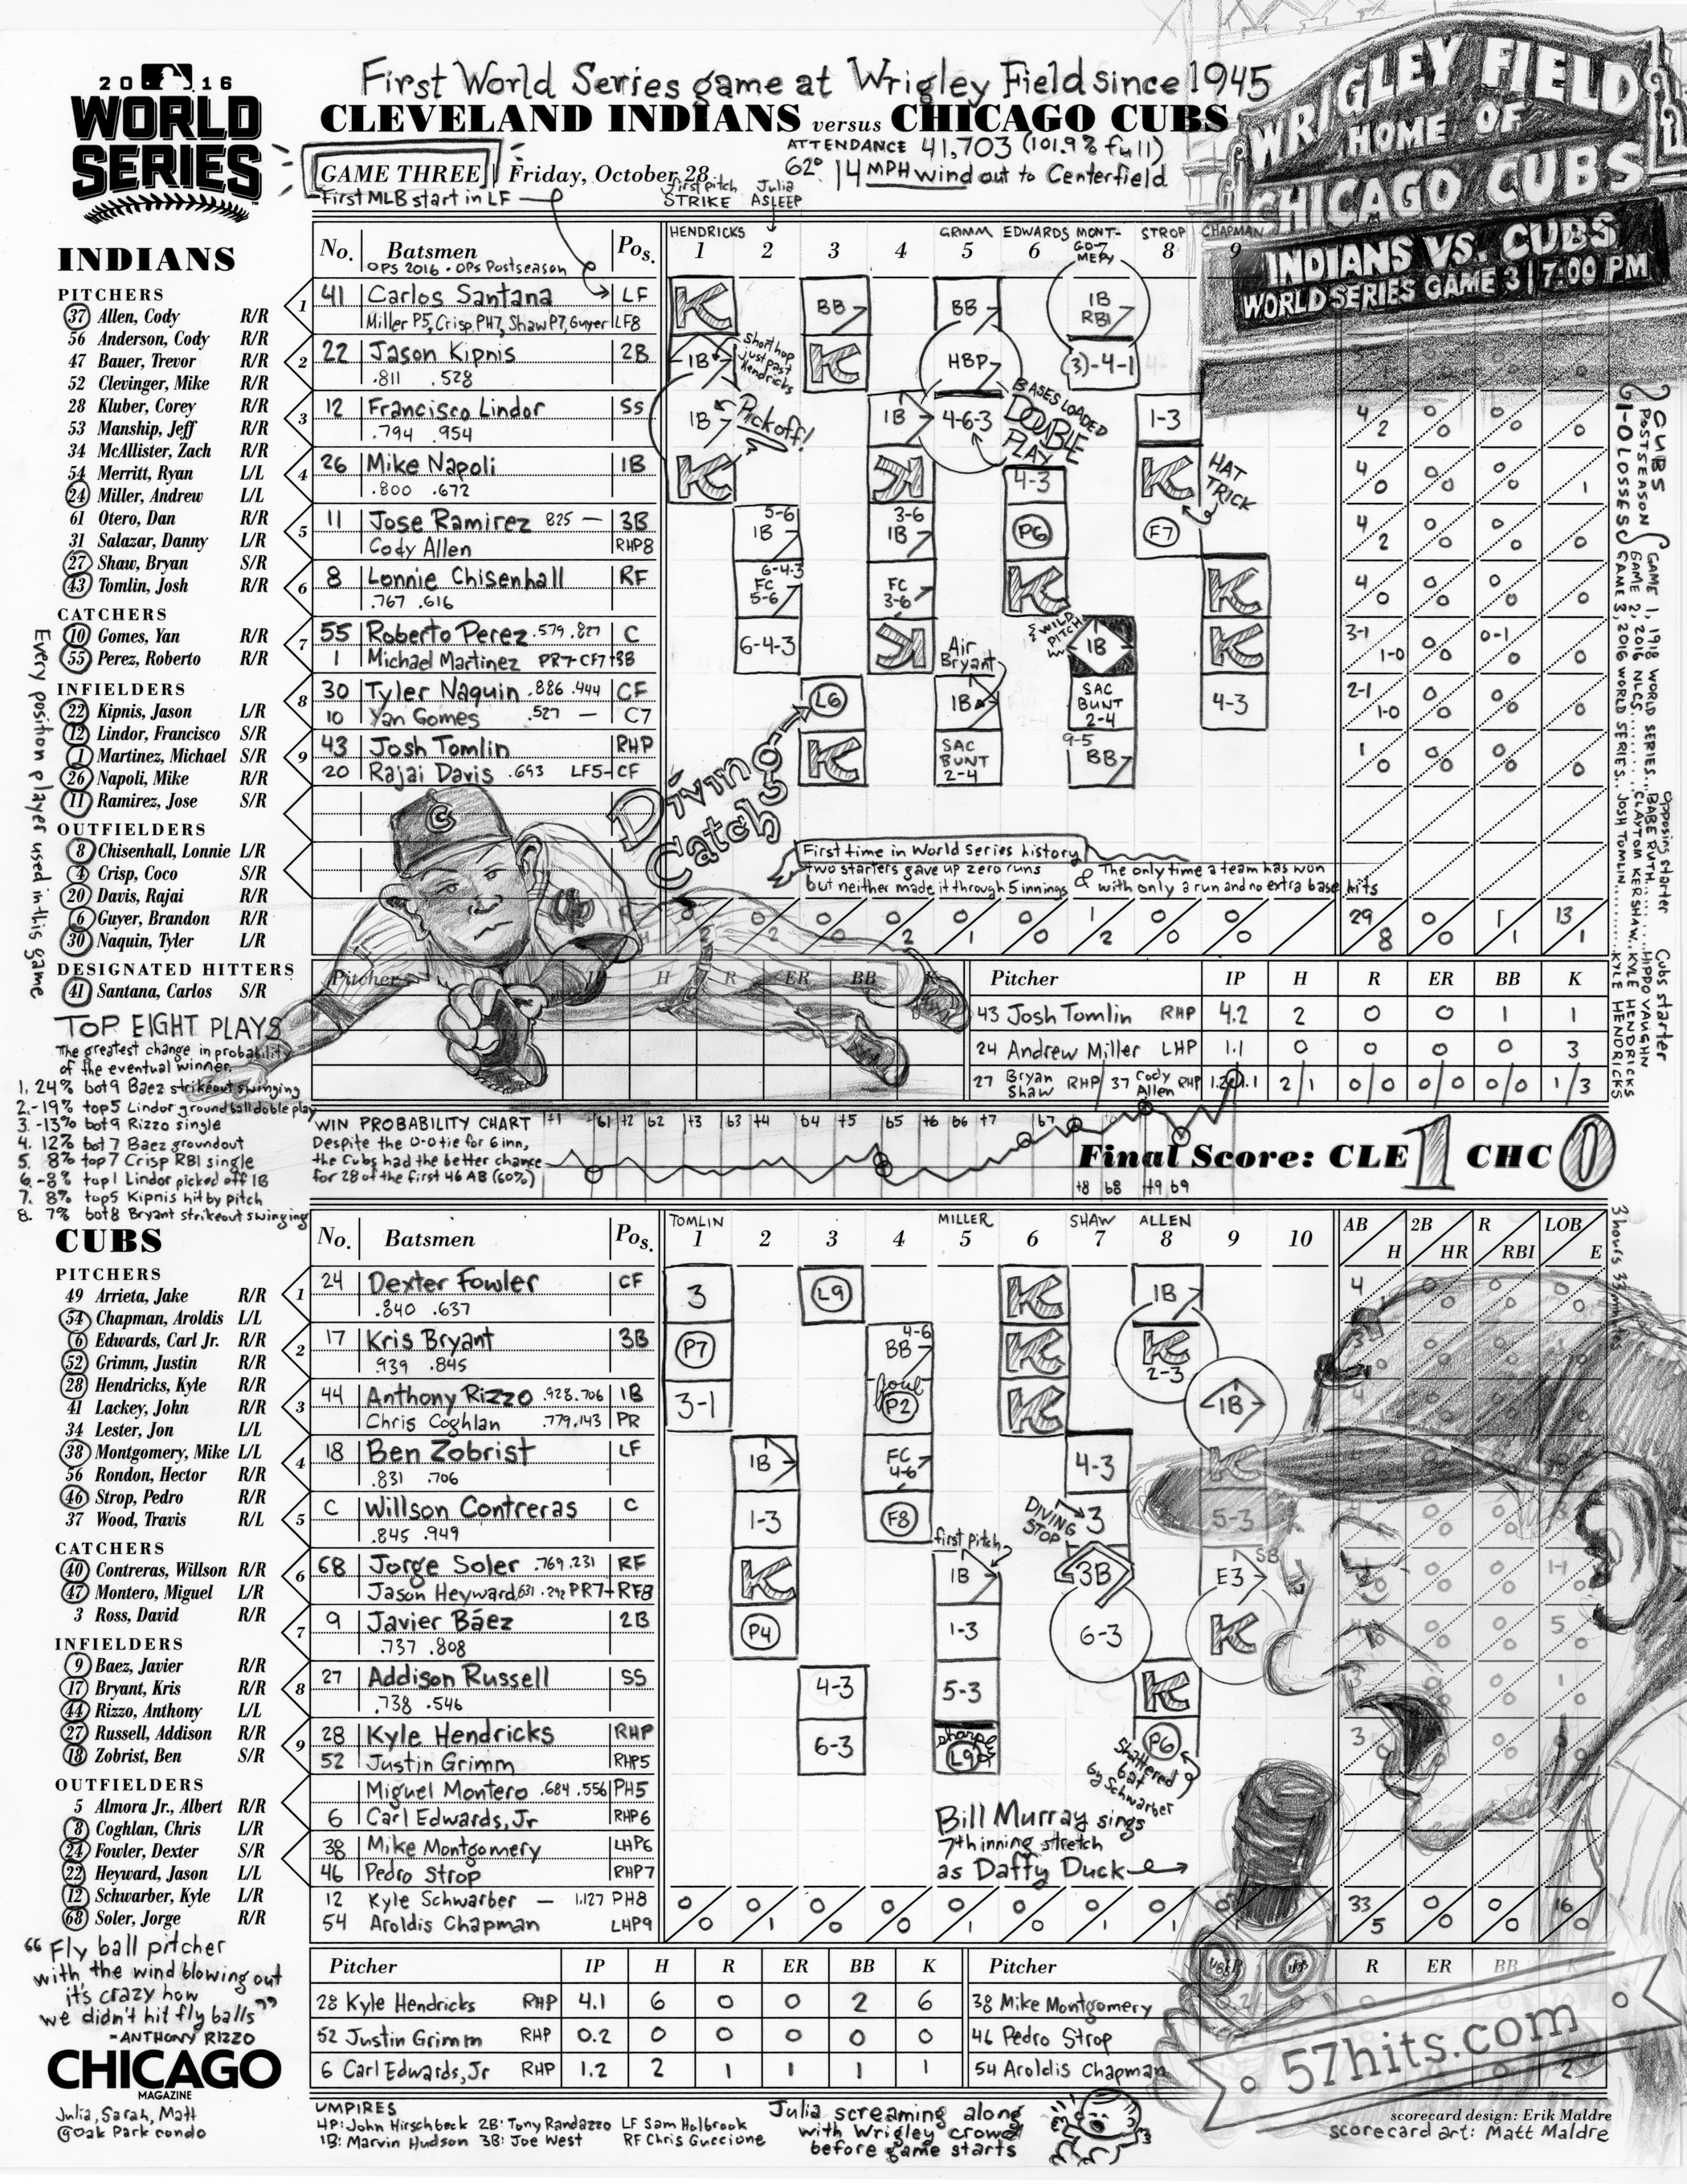 Game 3 scorecard for 2016 World Series by Matt Maldre